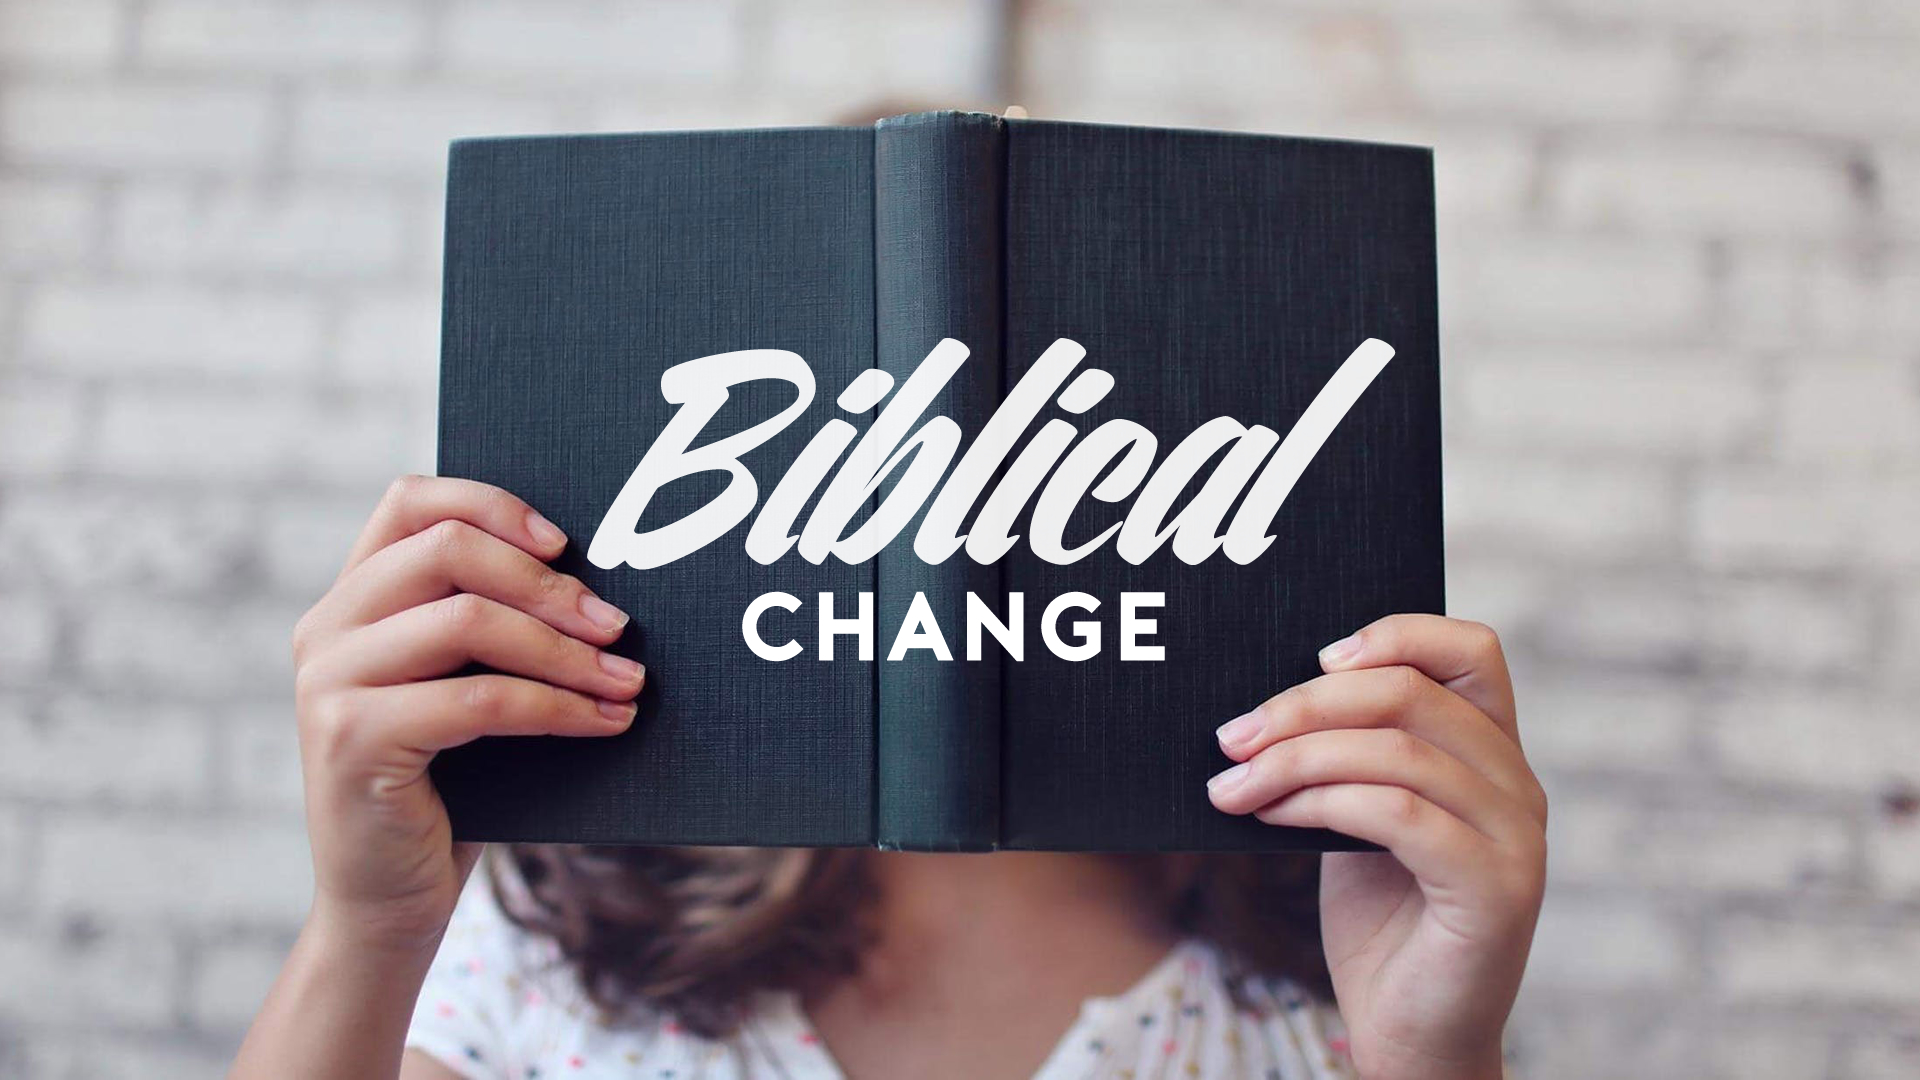 Biblical Change